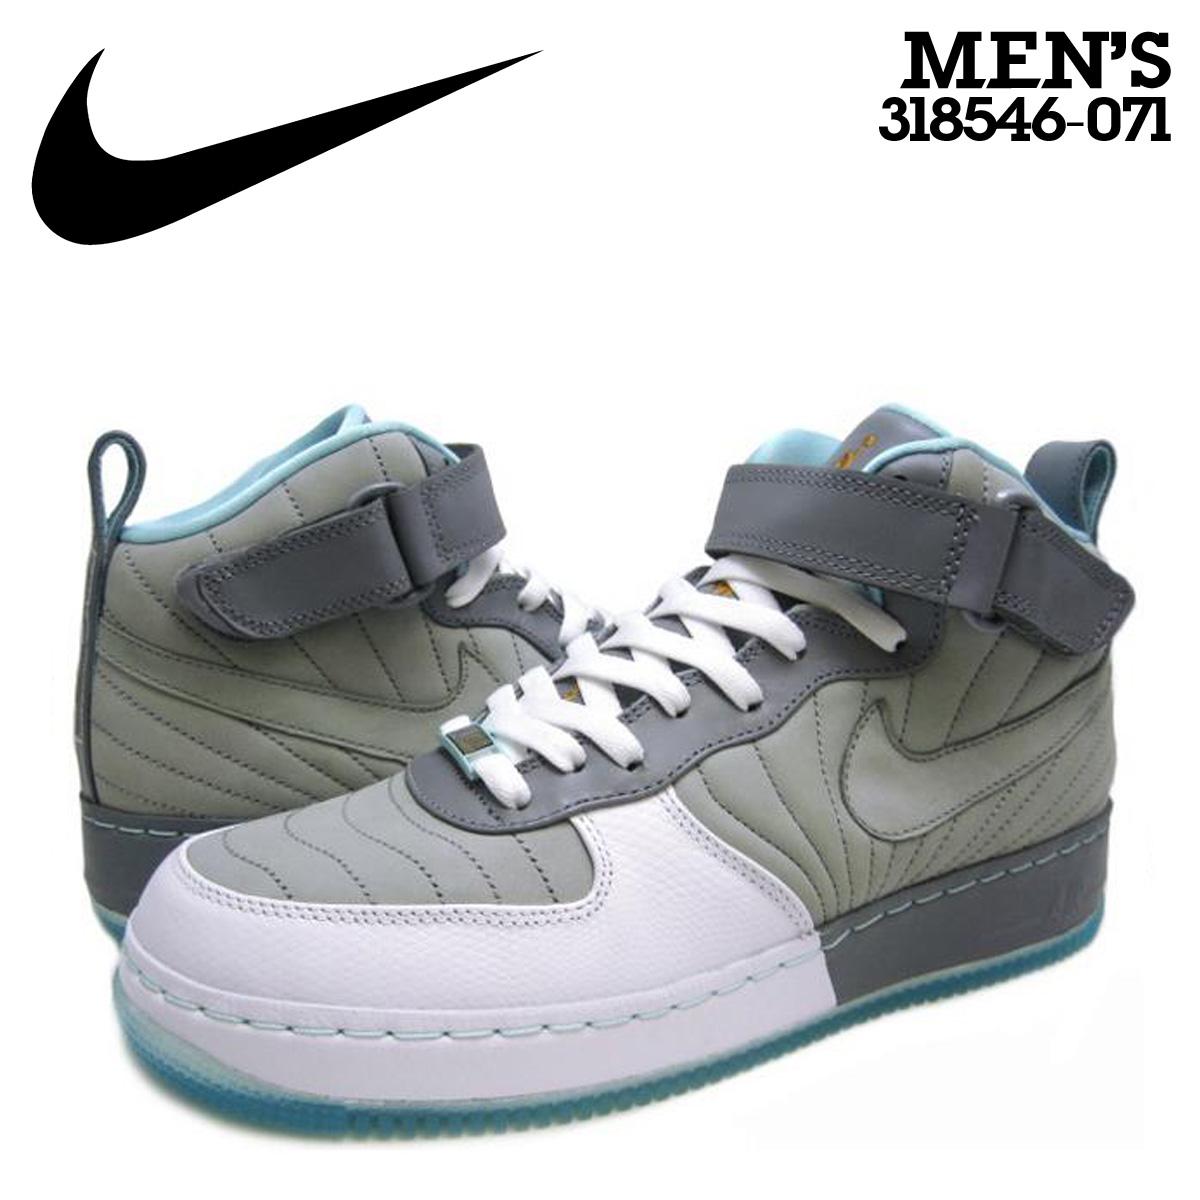 new product 205d9 081ac NIKE Nike Air Jordan sneakers AIR JORDAN FUSION 12 AF1 & AJ12 Air Jordan  fusion air force 318,546-071 white white men